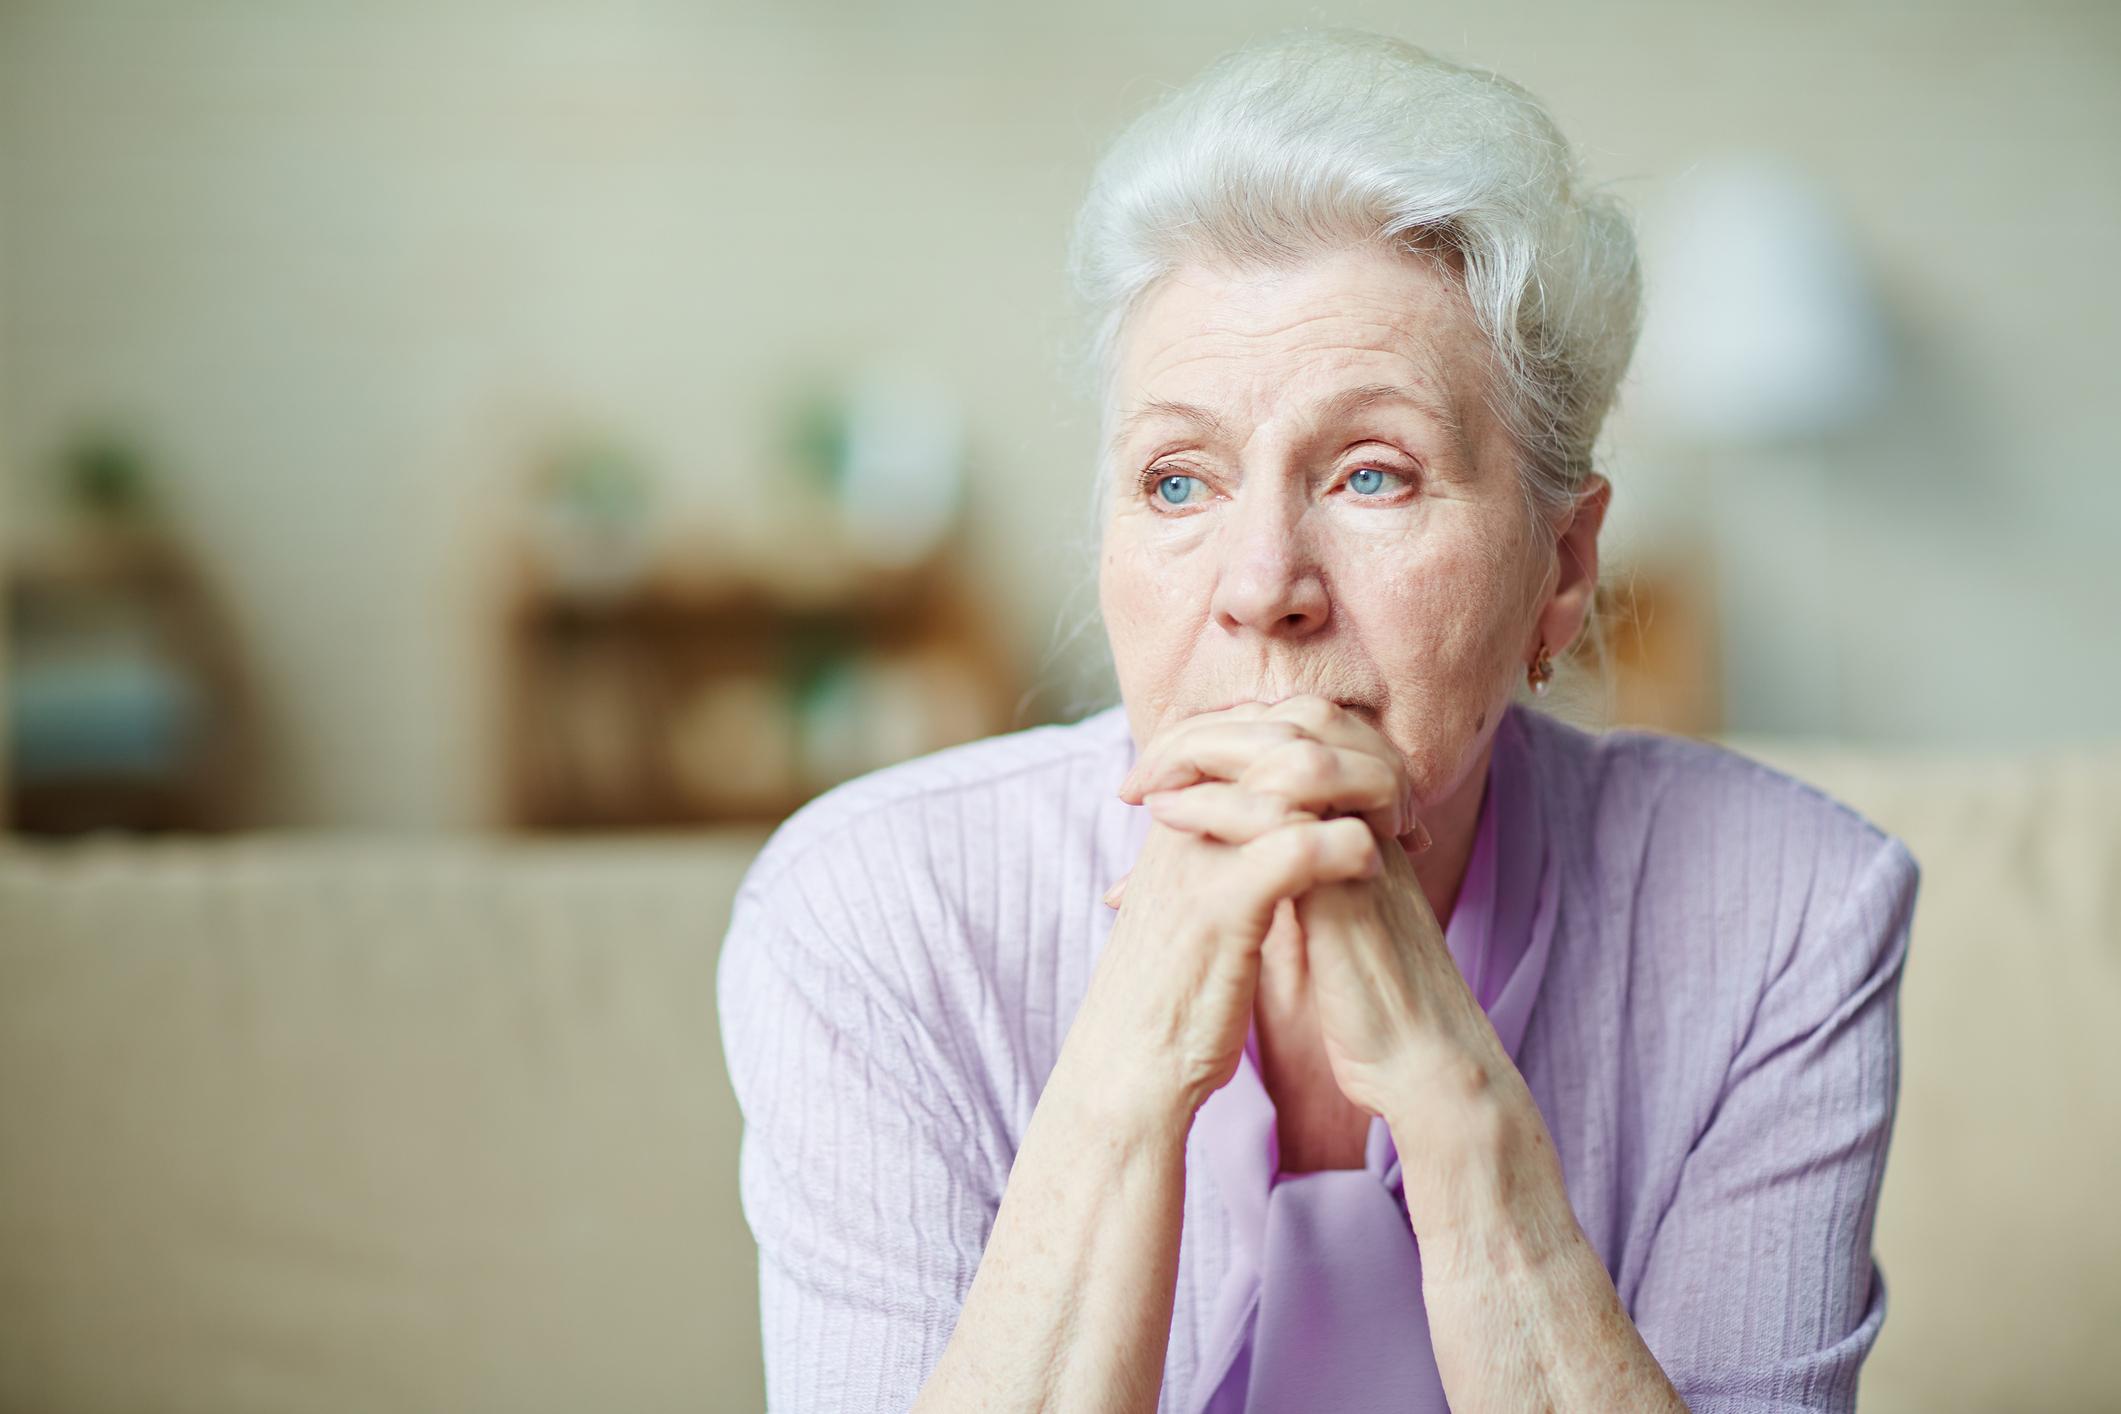 New Retirees Better Prepare for 25% Smaller Social Security Checks at 73